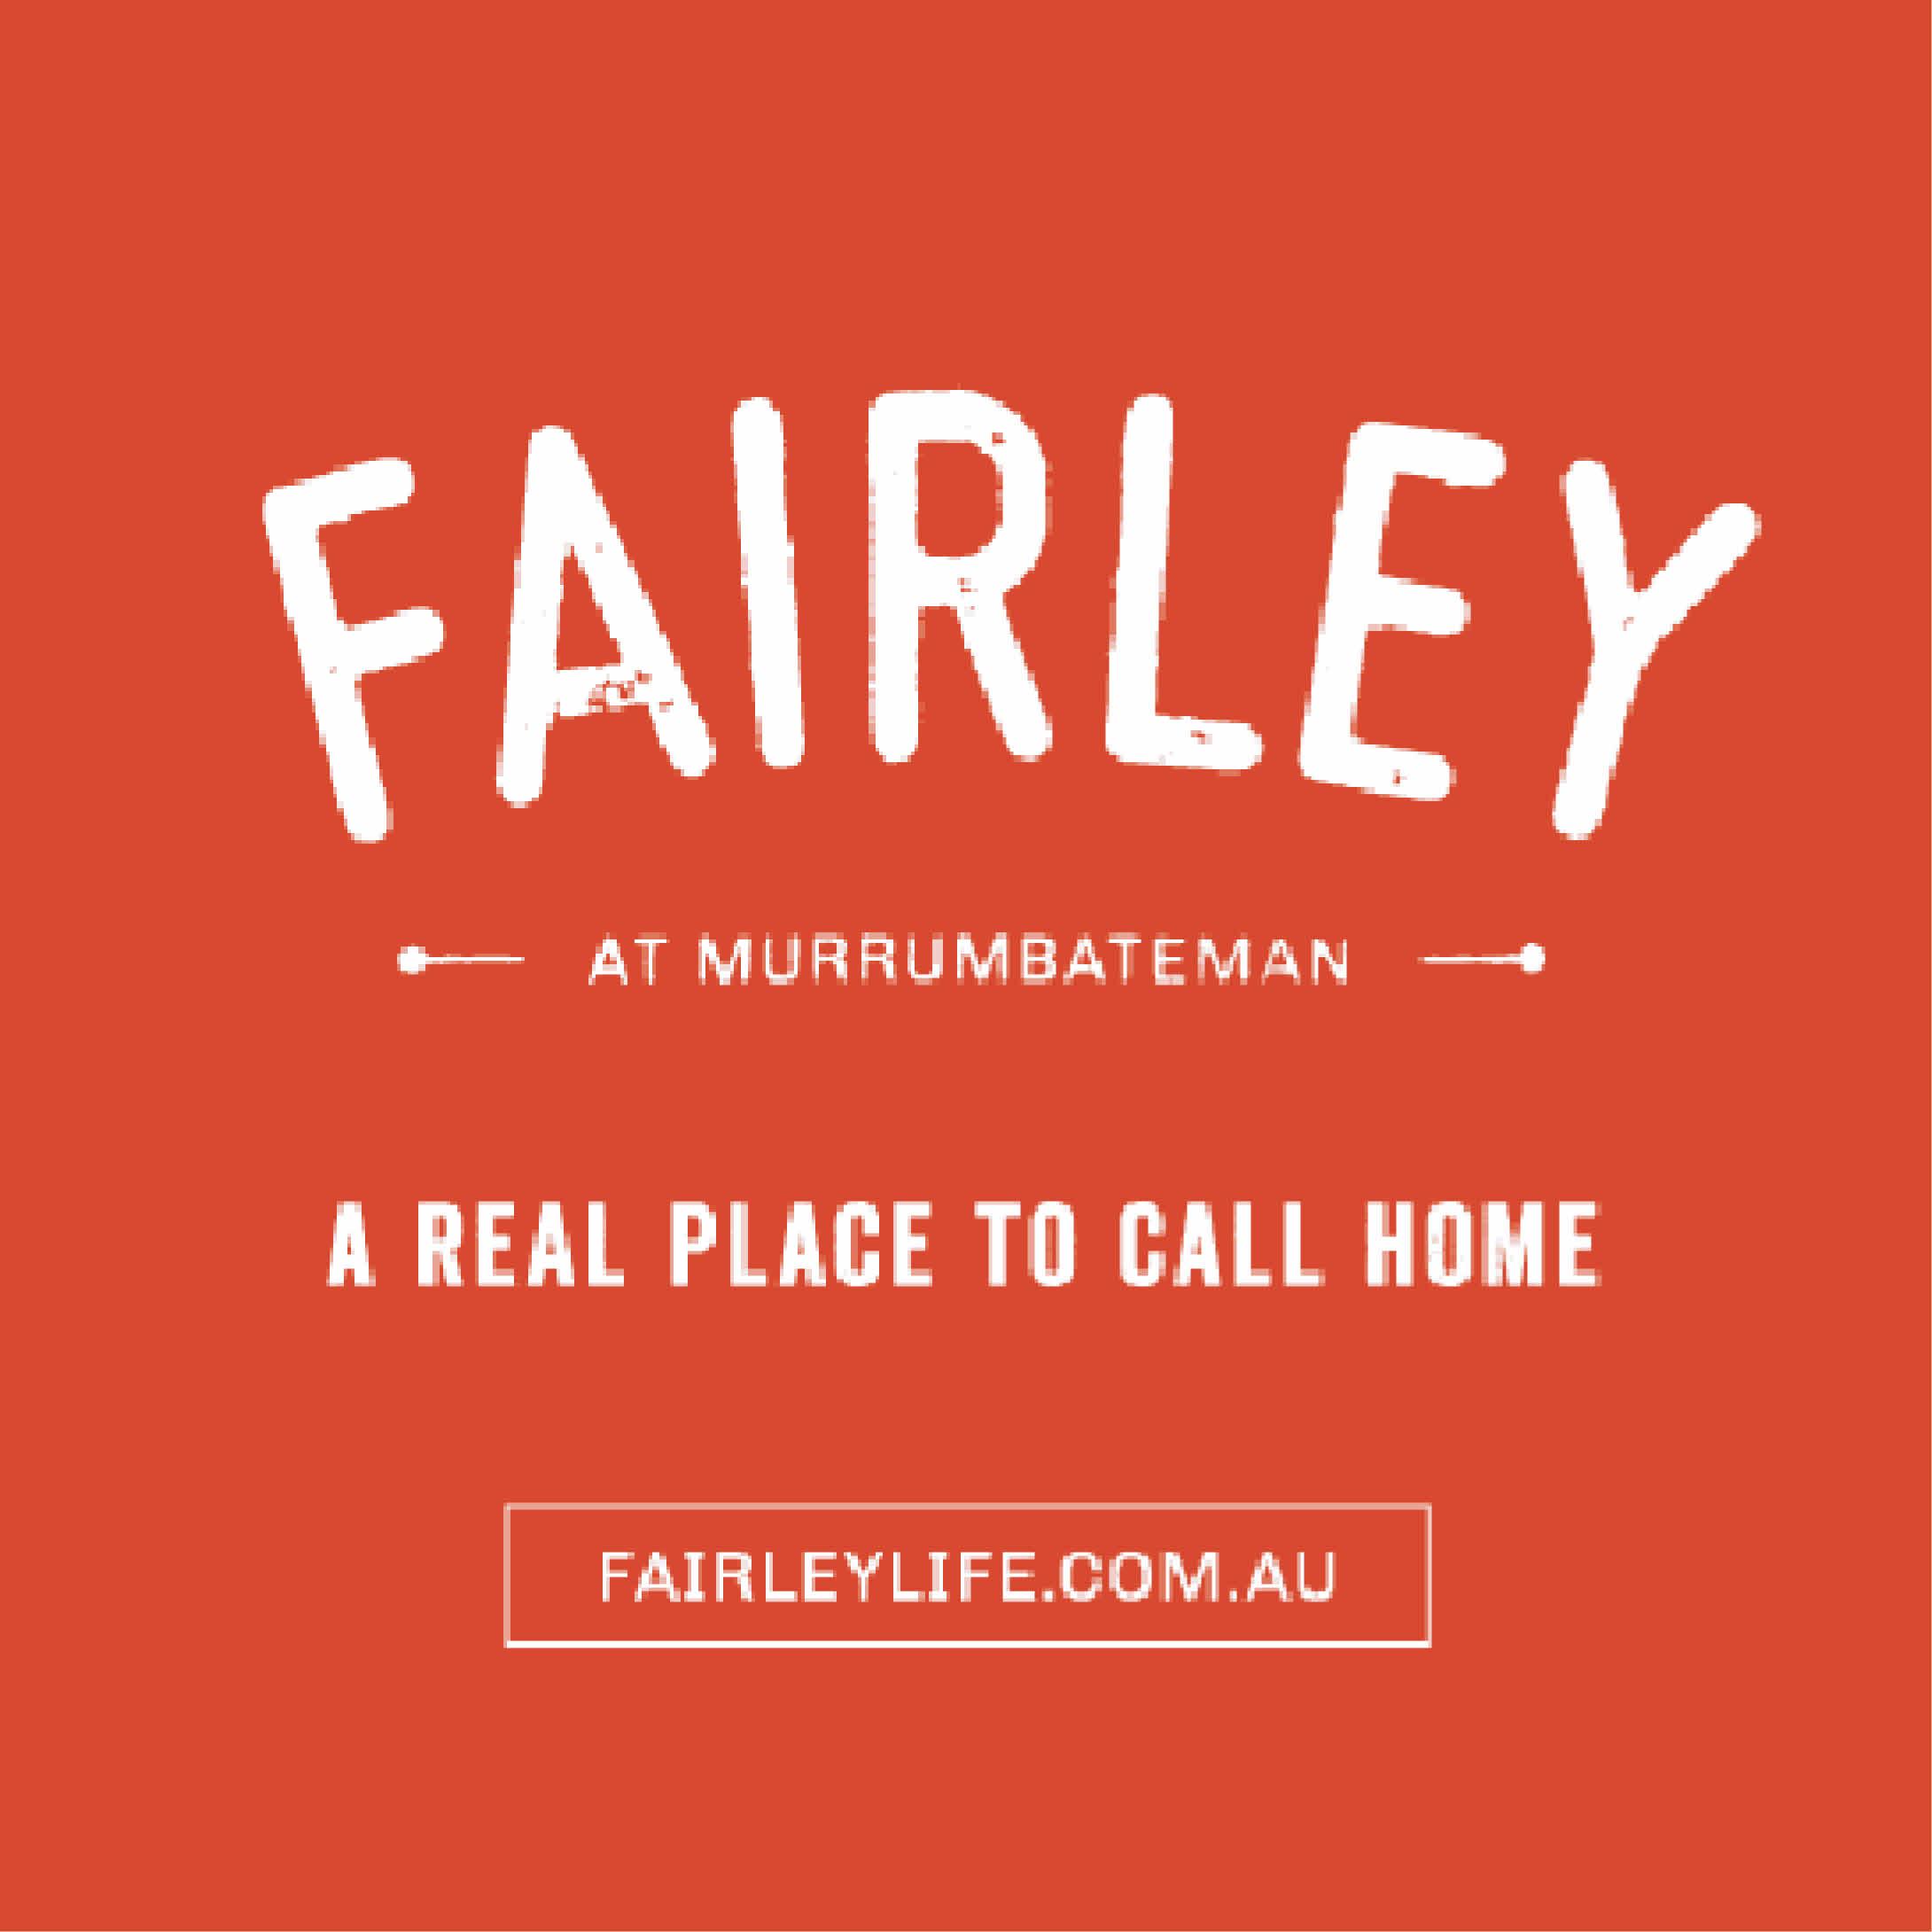 Fairley logo